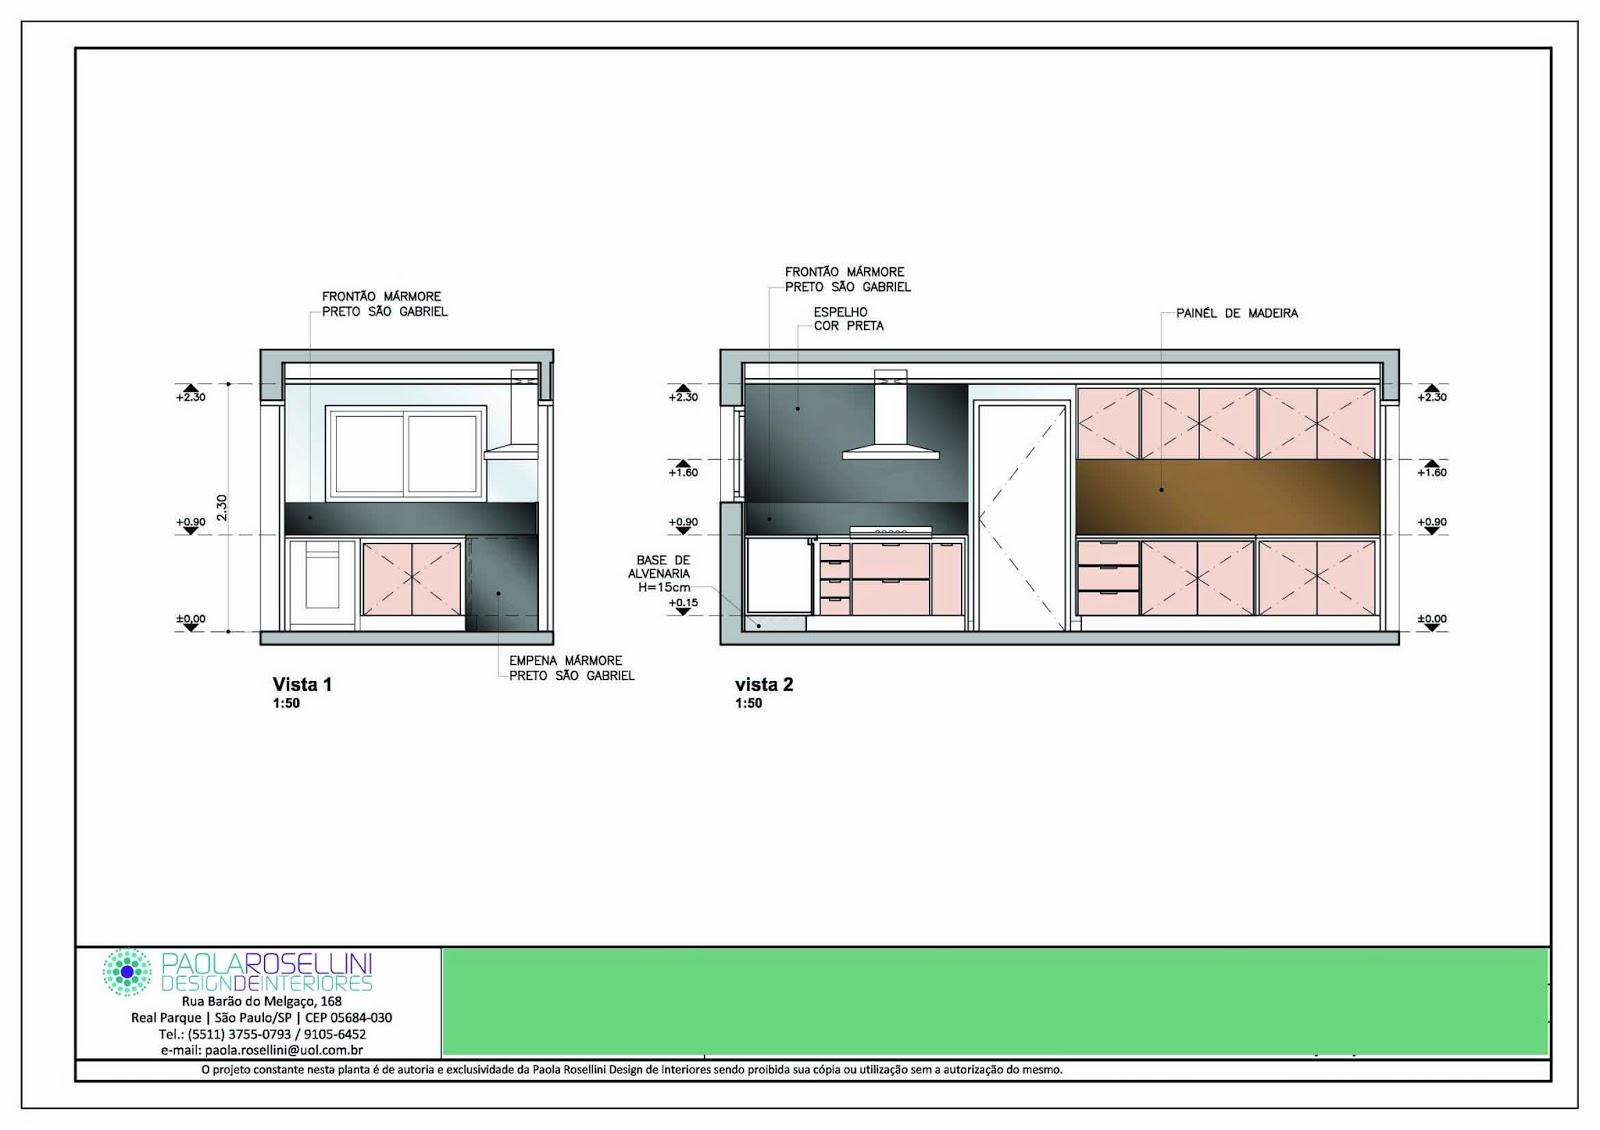 MARIANA PROJETISTA: Arquitetura #:Nichos de projeto de interiores #2BA043 1600 1130